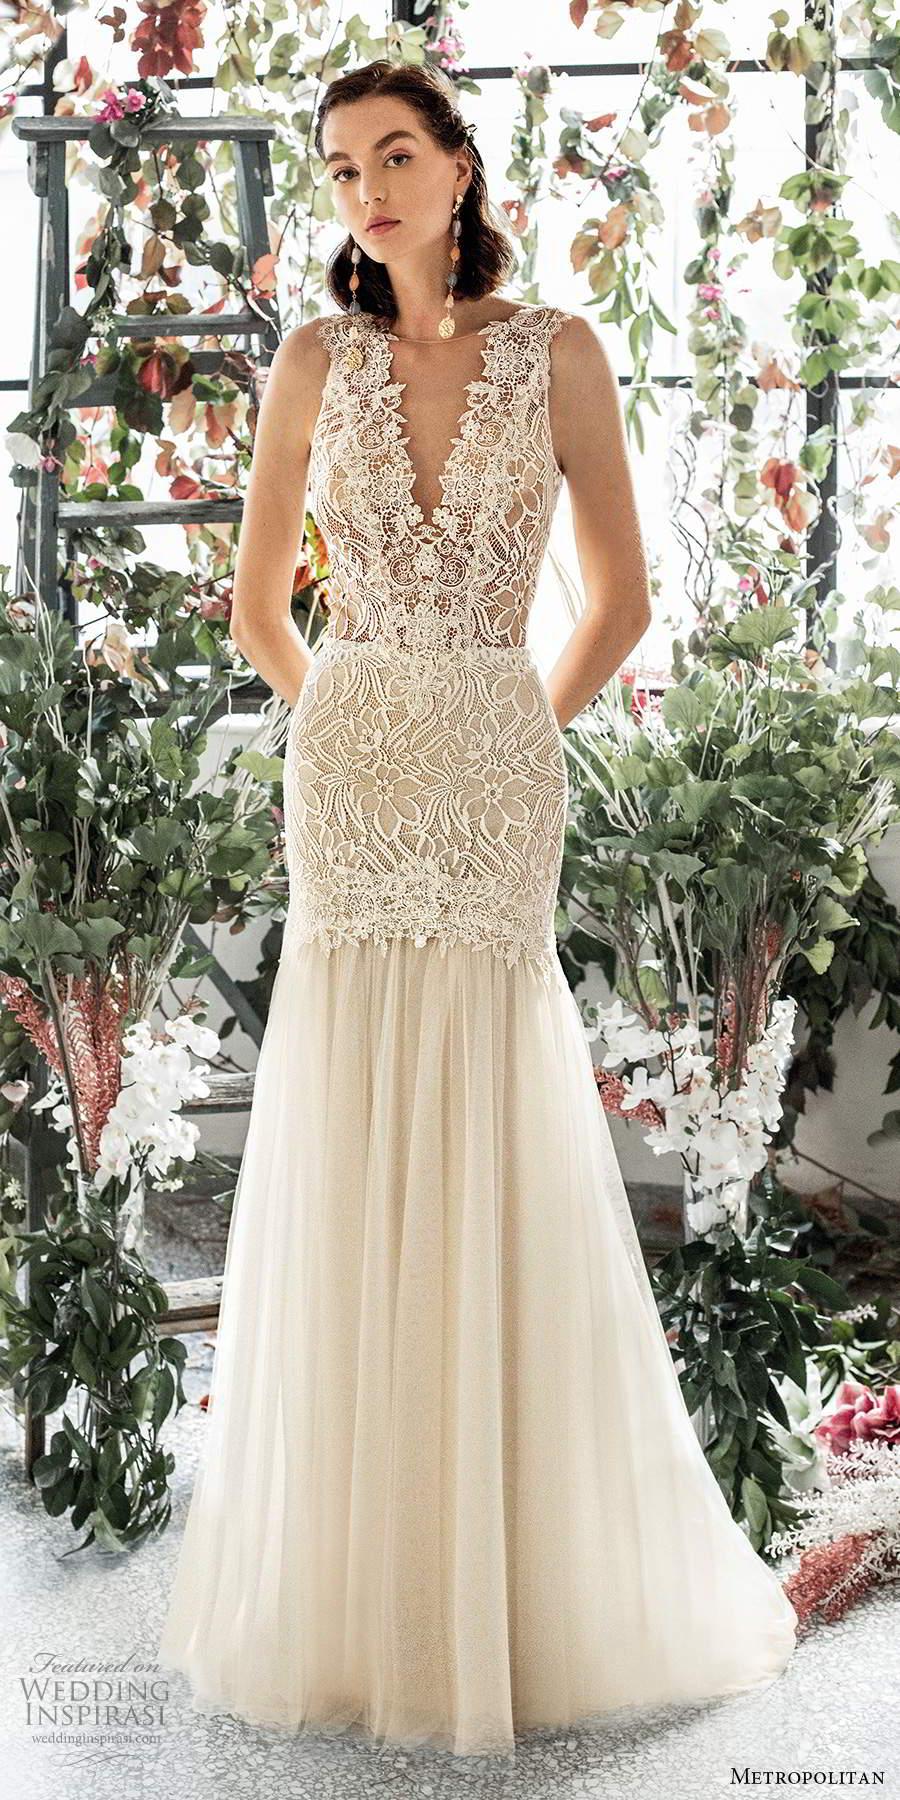 metropolitan spring 2020 bridal sleeveless thick straps plunging v neckline embellished lace bodice fit flare mermaid wedding dress scoop back chapel train (7) mv